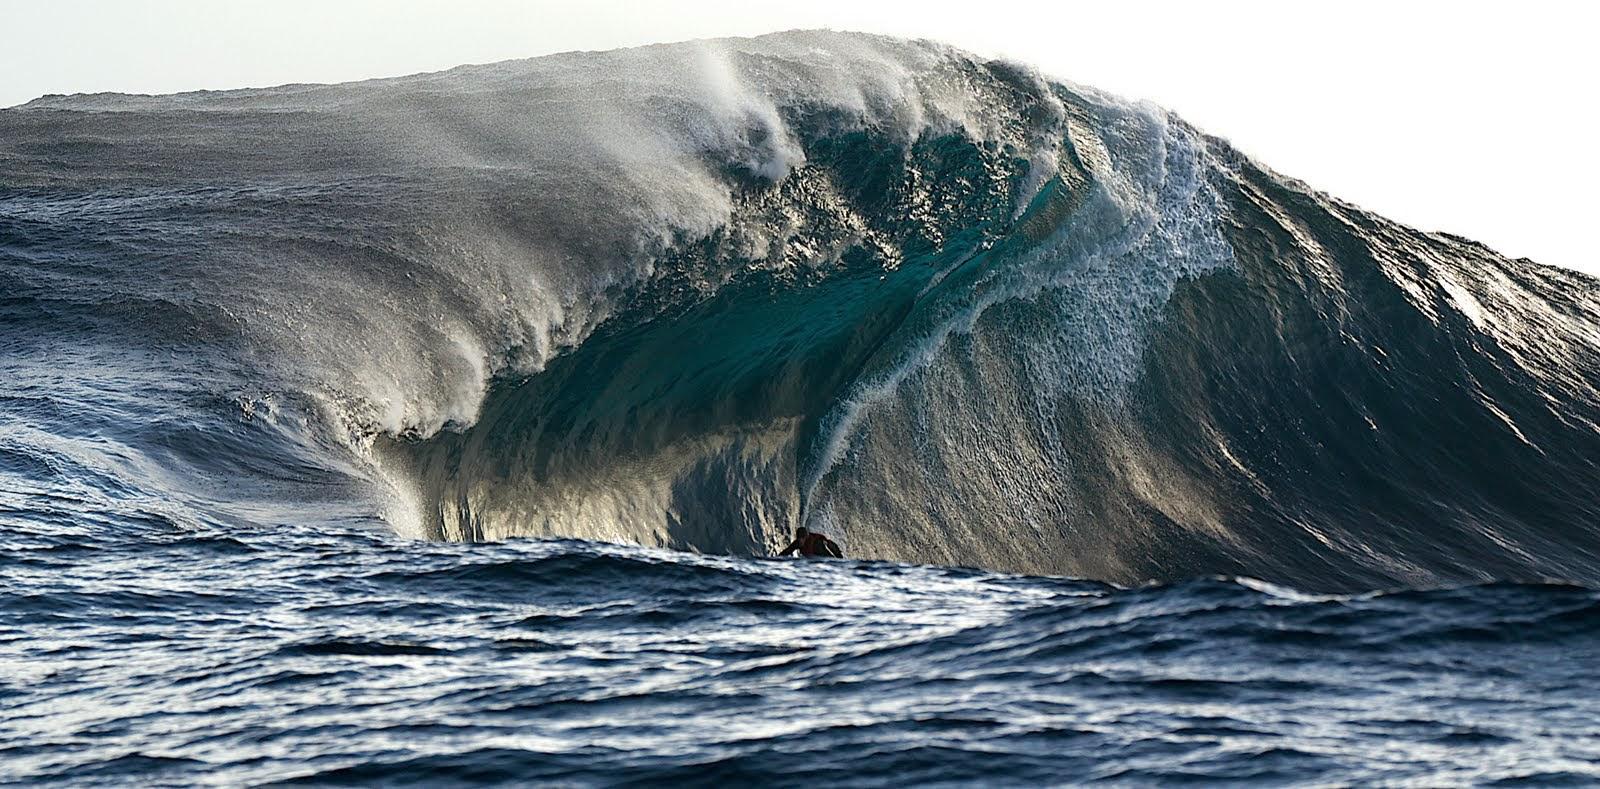 Surfing or sinking?